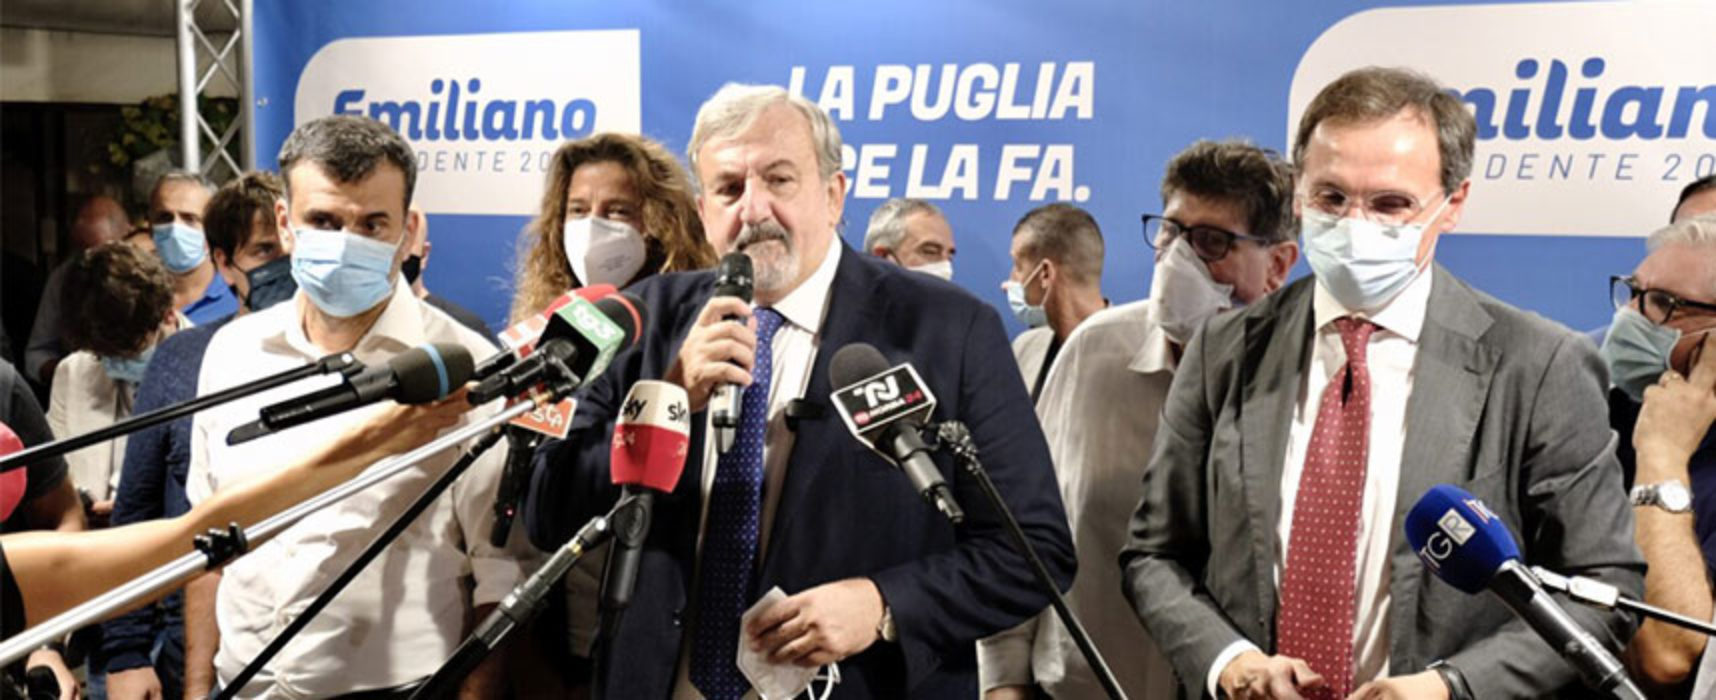 Regionali Puglia 2020: Emiliano si impone nettamente ancha a Bisceglie / Dati definitivi